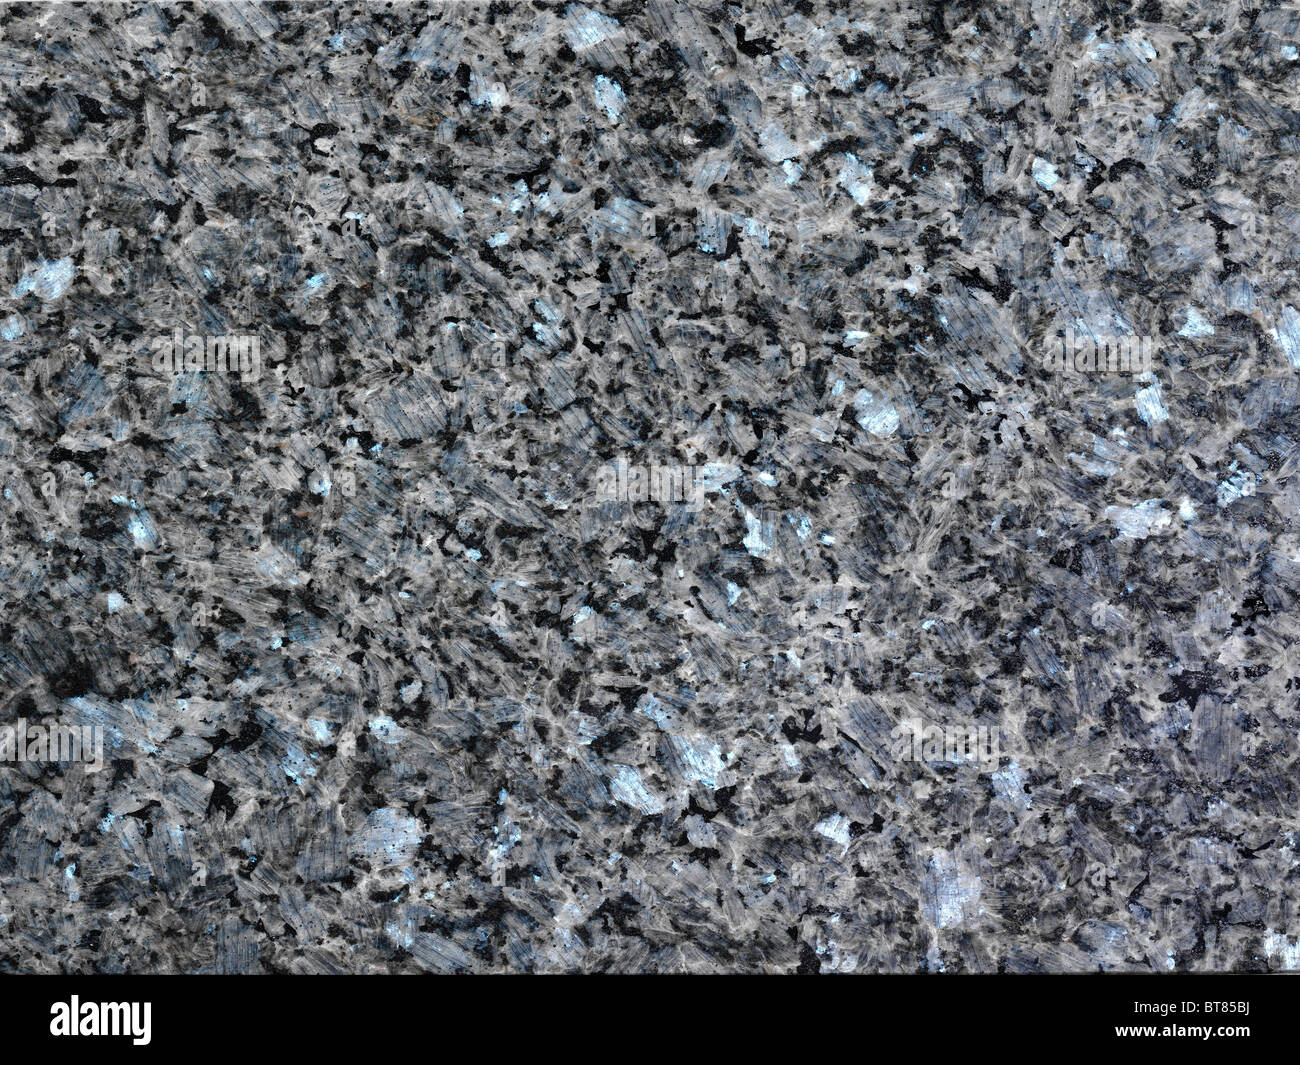 Granite structure - Stock Image